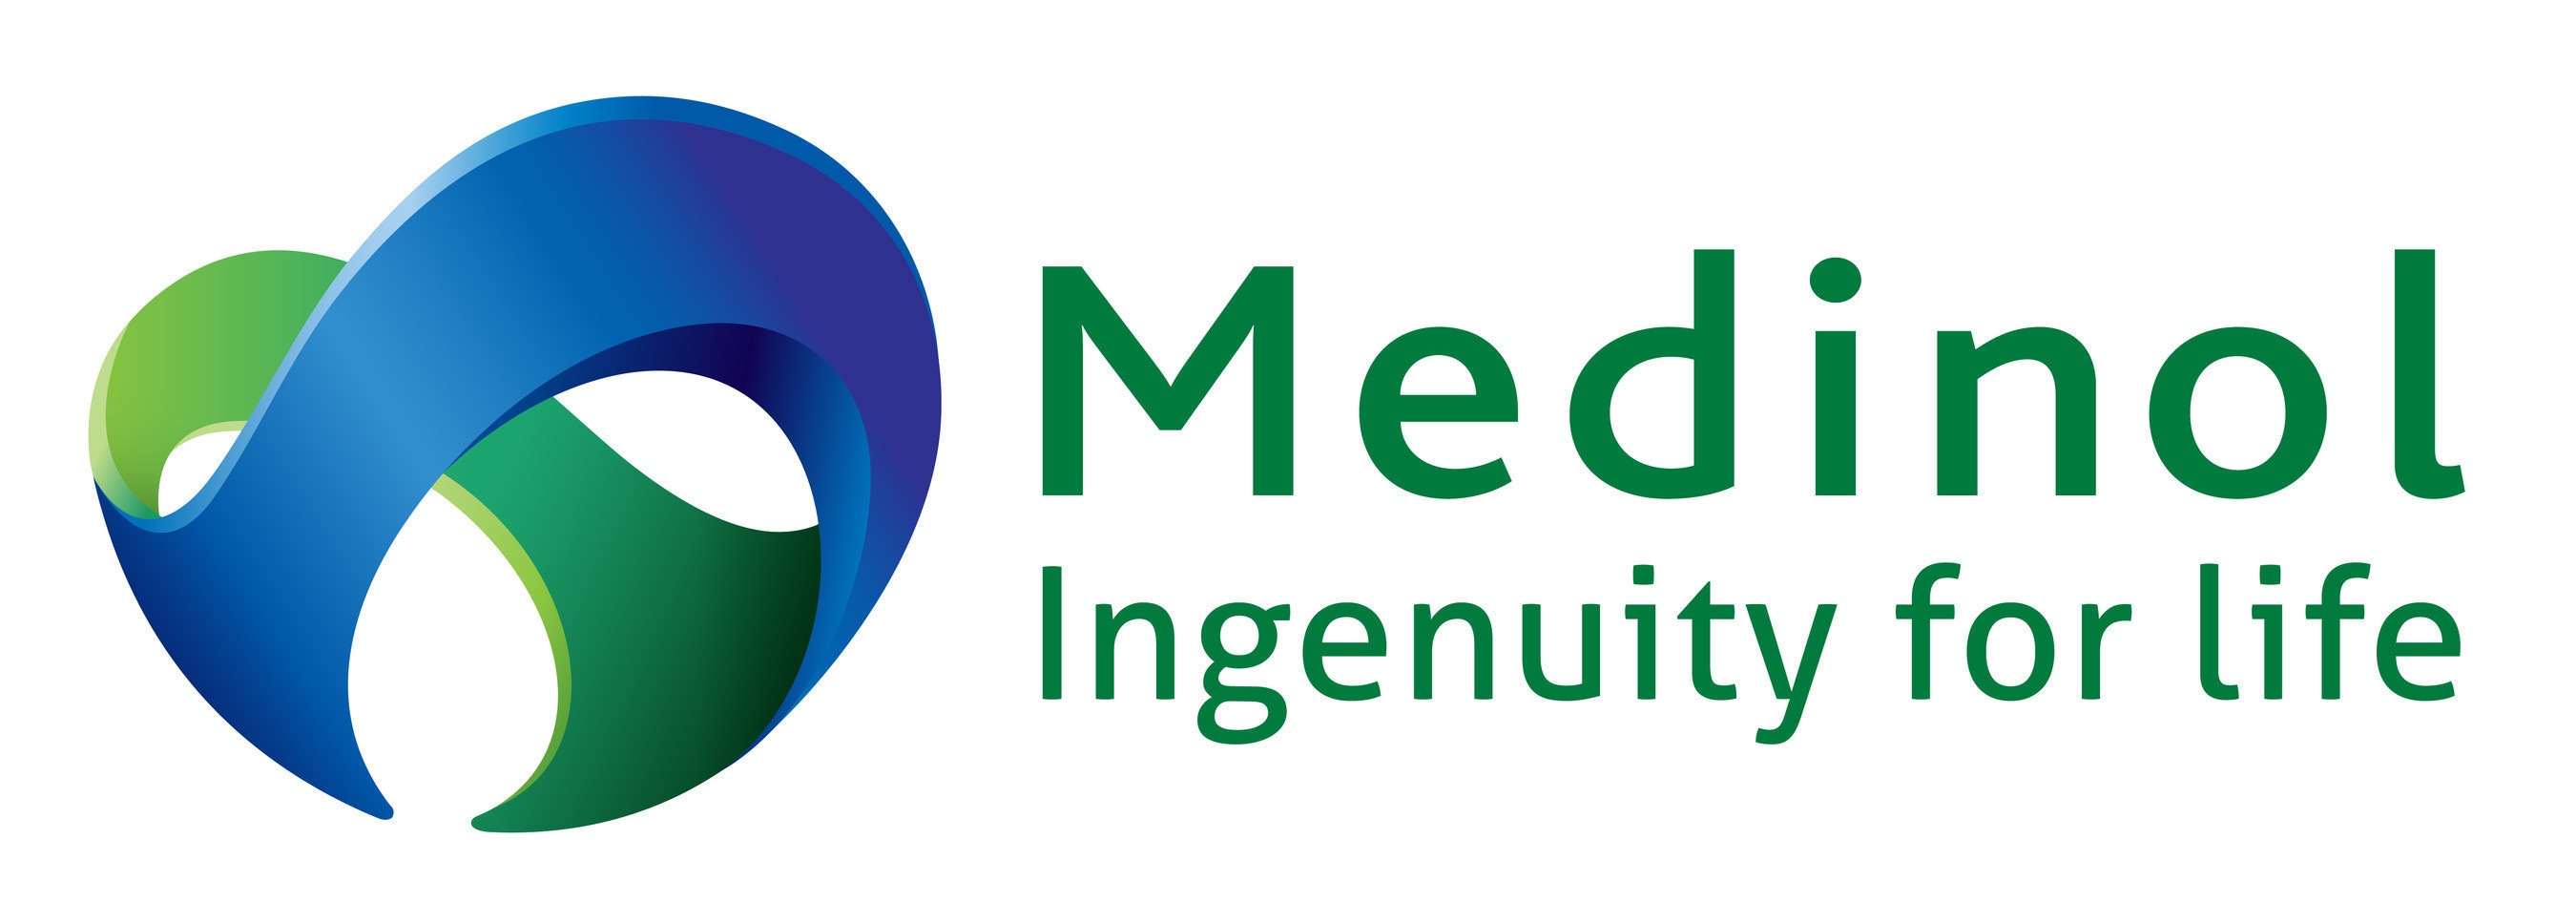 Medinol logo